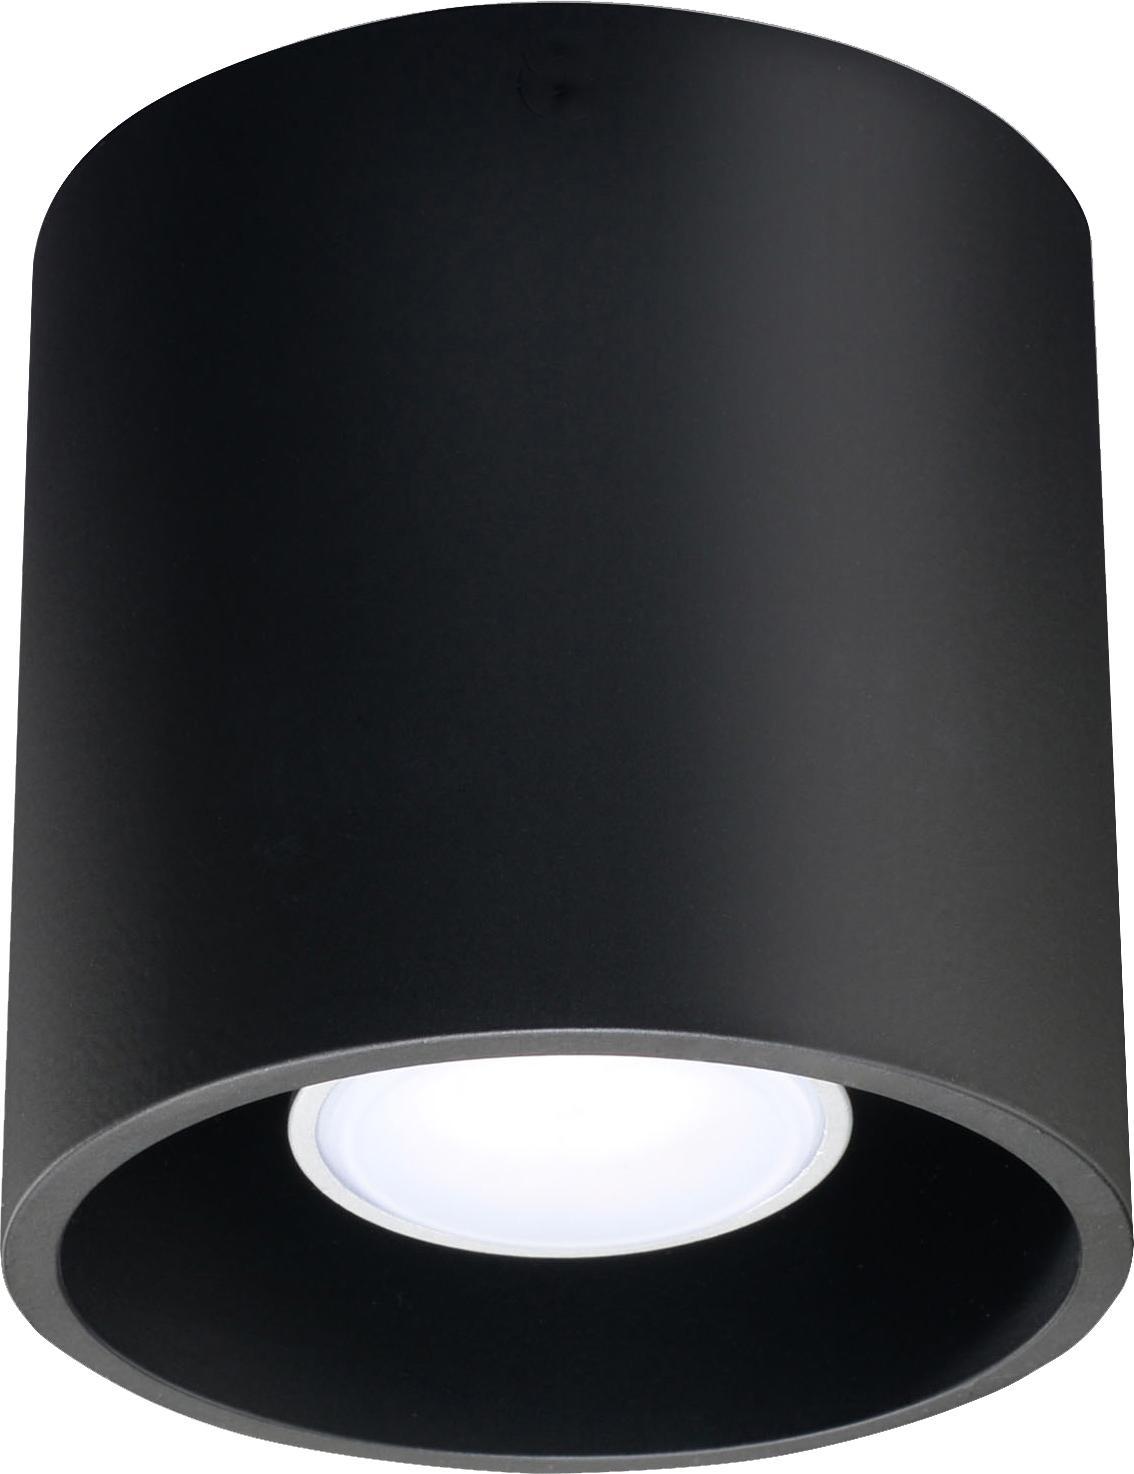 Plafondspot Roda in zwart, Gecoat aluminium, Zwart, Ø 10 x H 10 cm